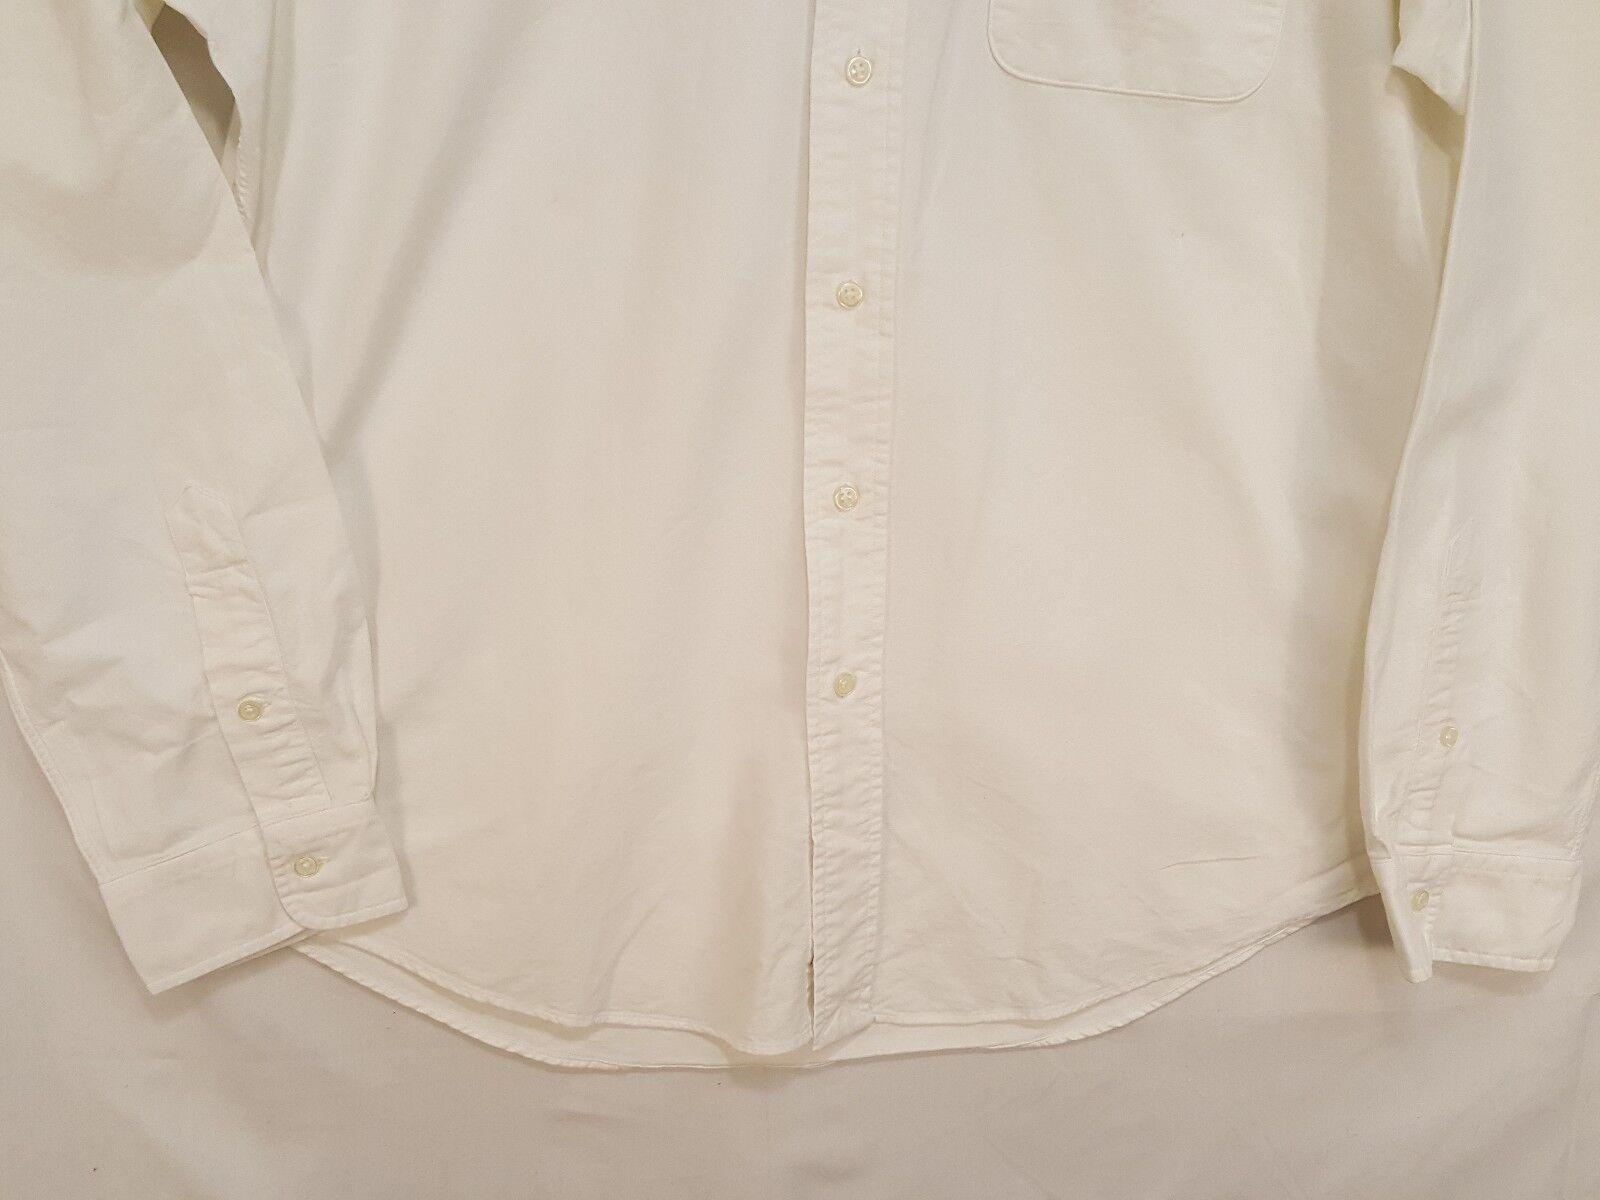 Harley Davidson Short Button Sleeve Button Short Front Shirt marrone Size L Embroiderosso Eagle 27e0a6